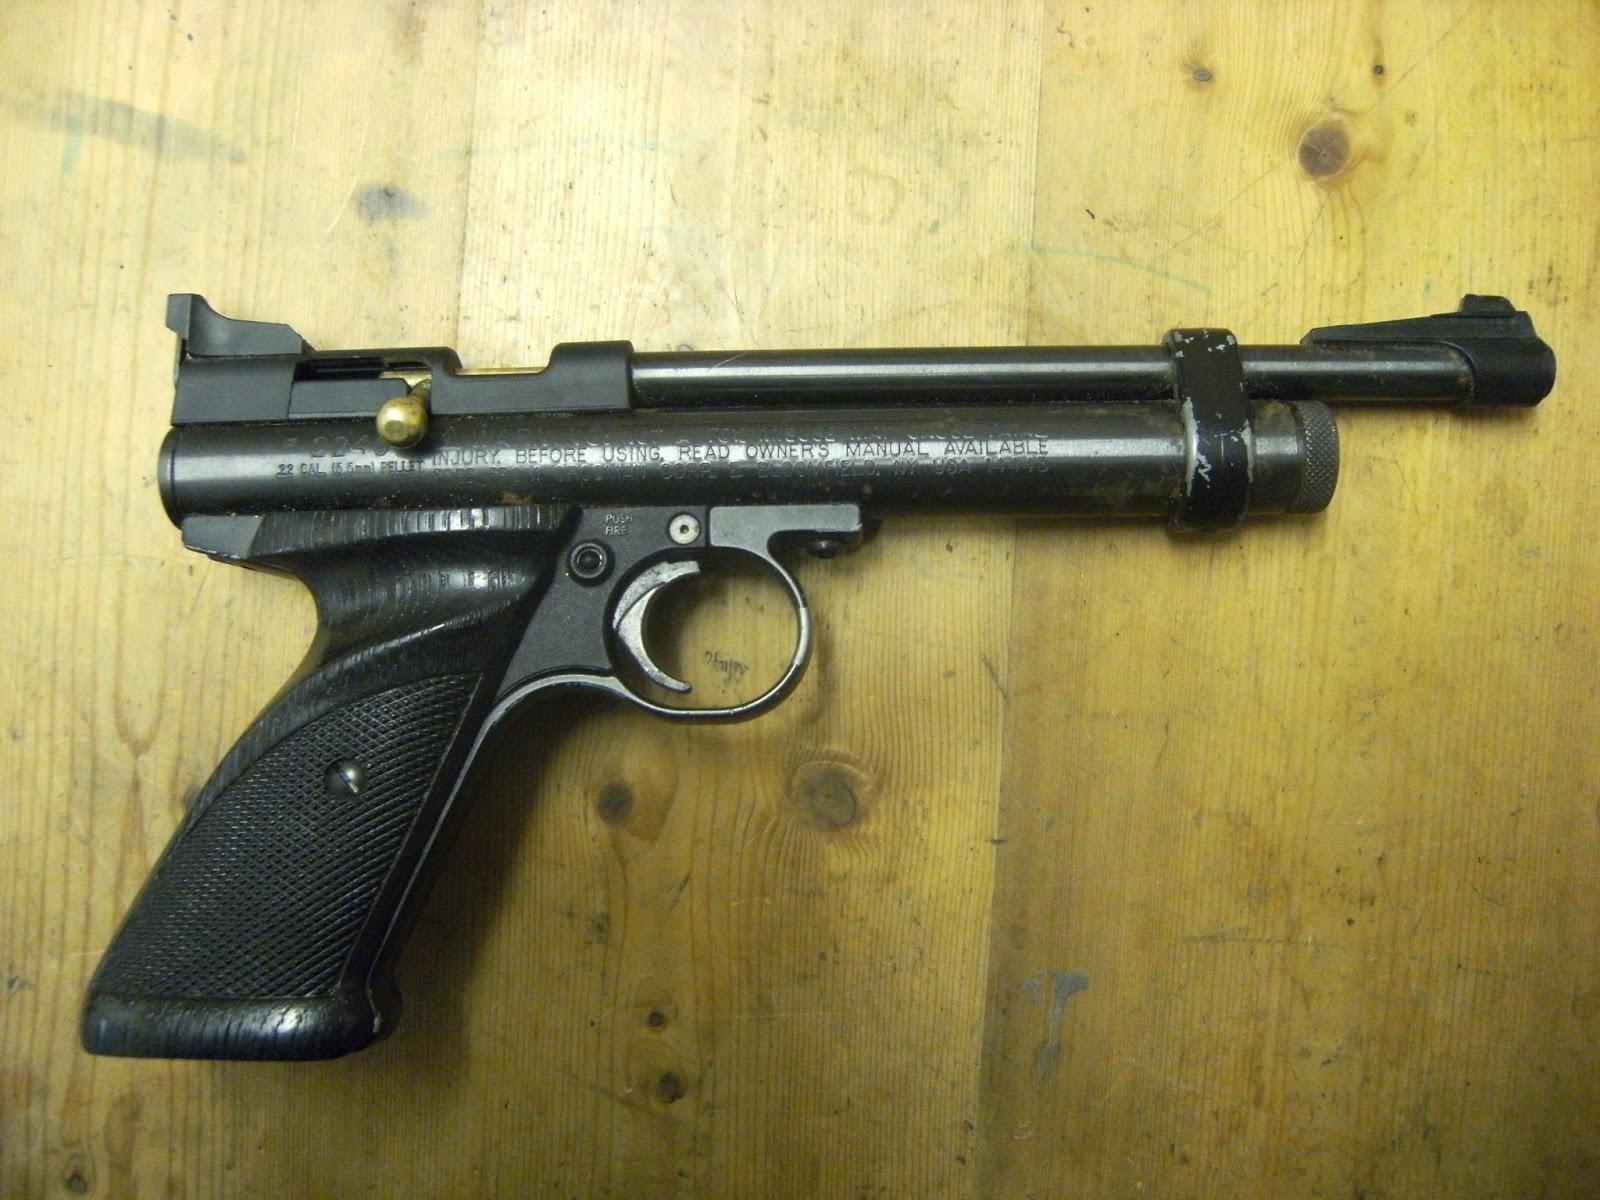 the angry angry gun company crosman 2240 co2 pistol the most rh angryangryguncompany blogspot com Crosman Steel Breech 2240 With Modified Crosman 2240